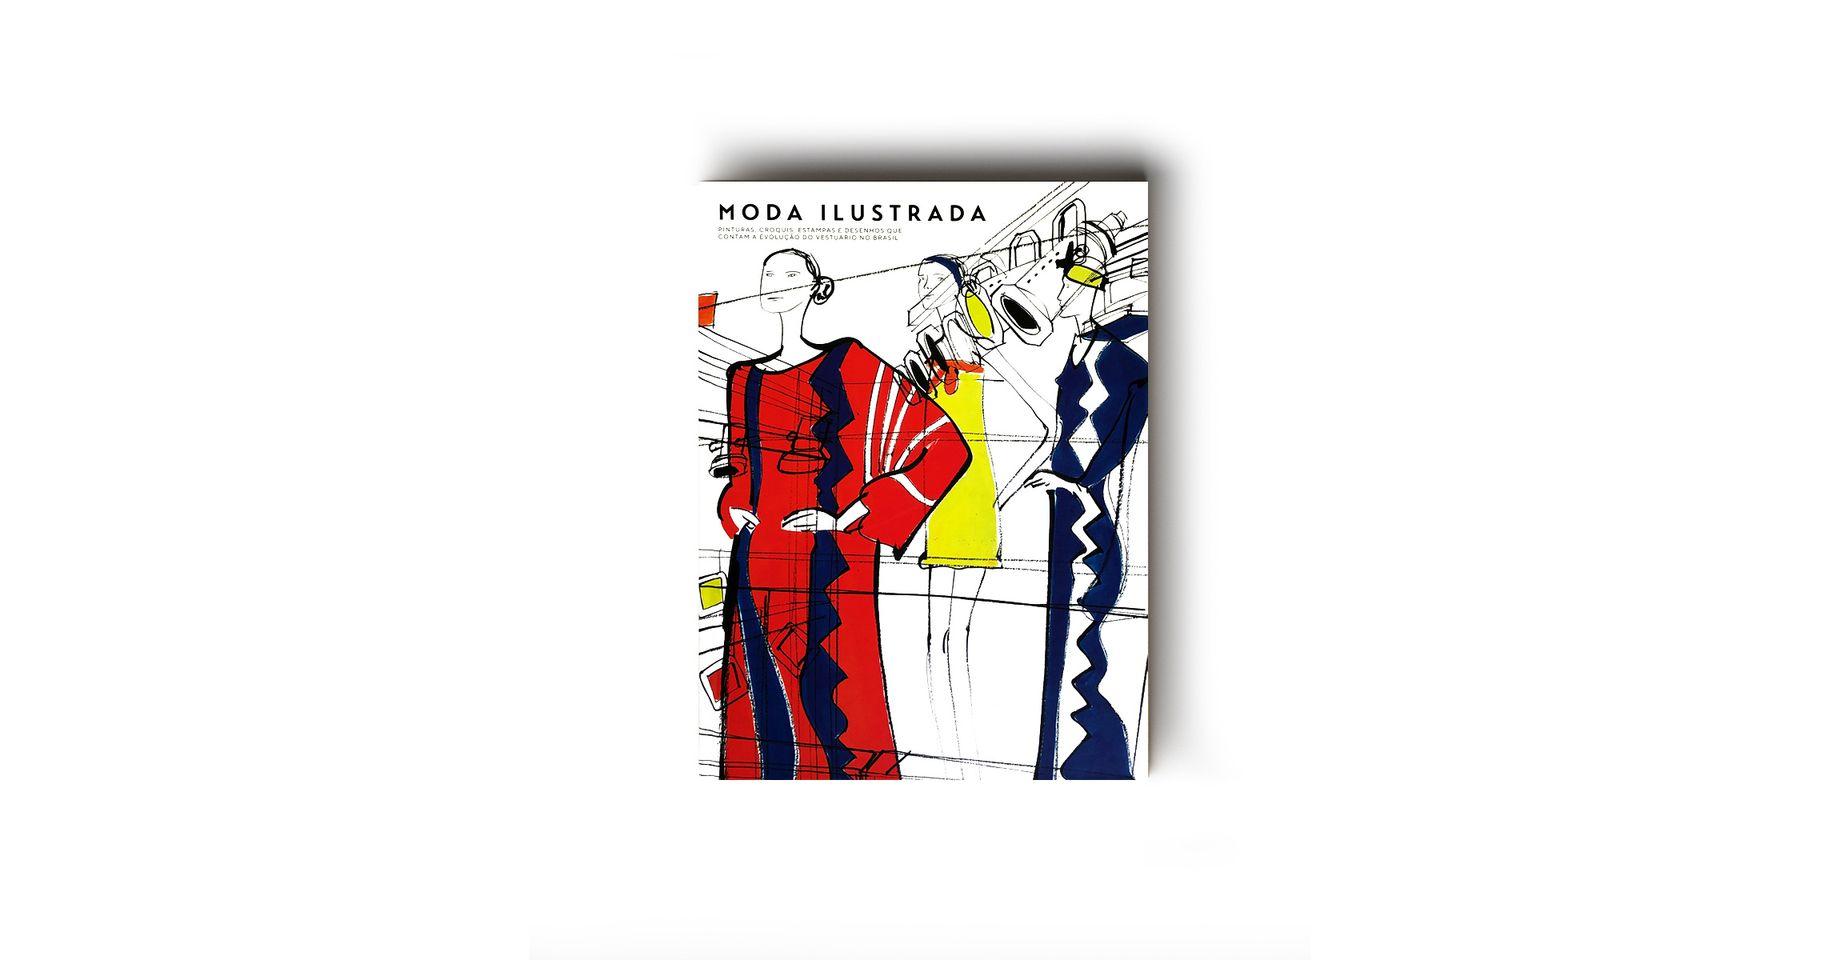 moda_ilustrada_1000x1200_1